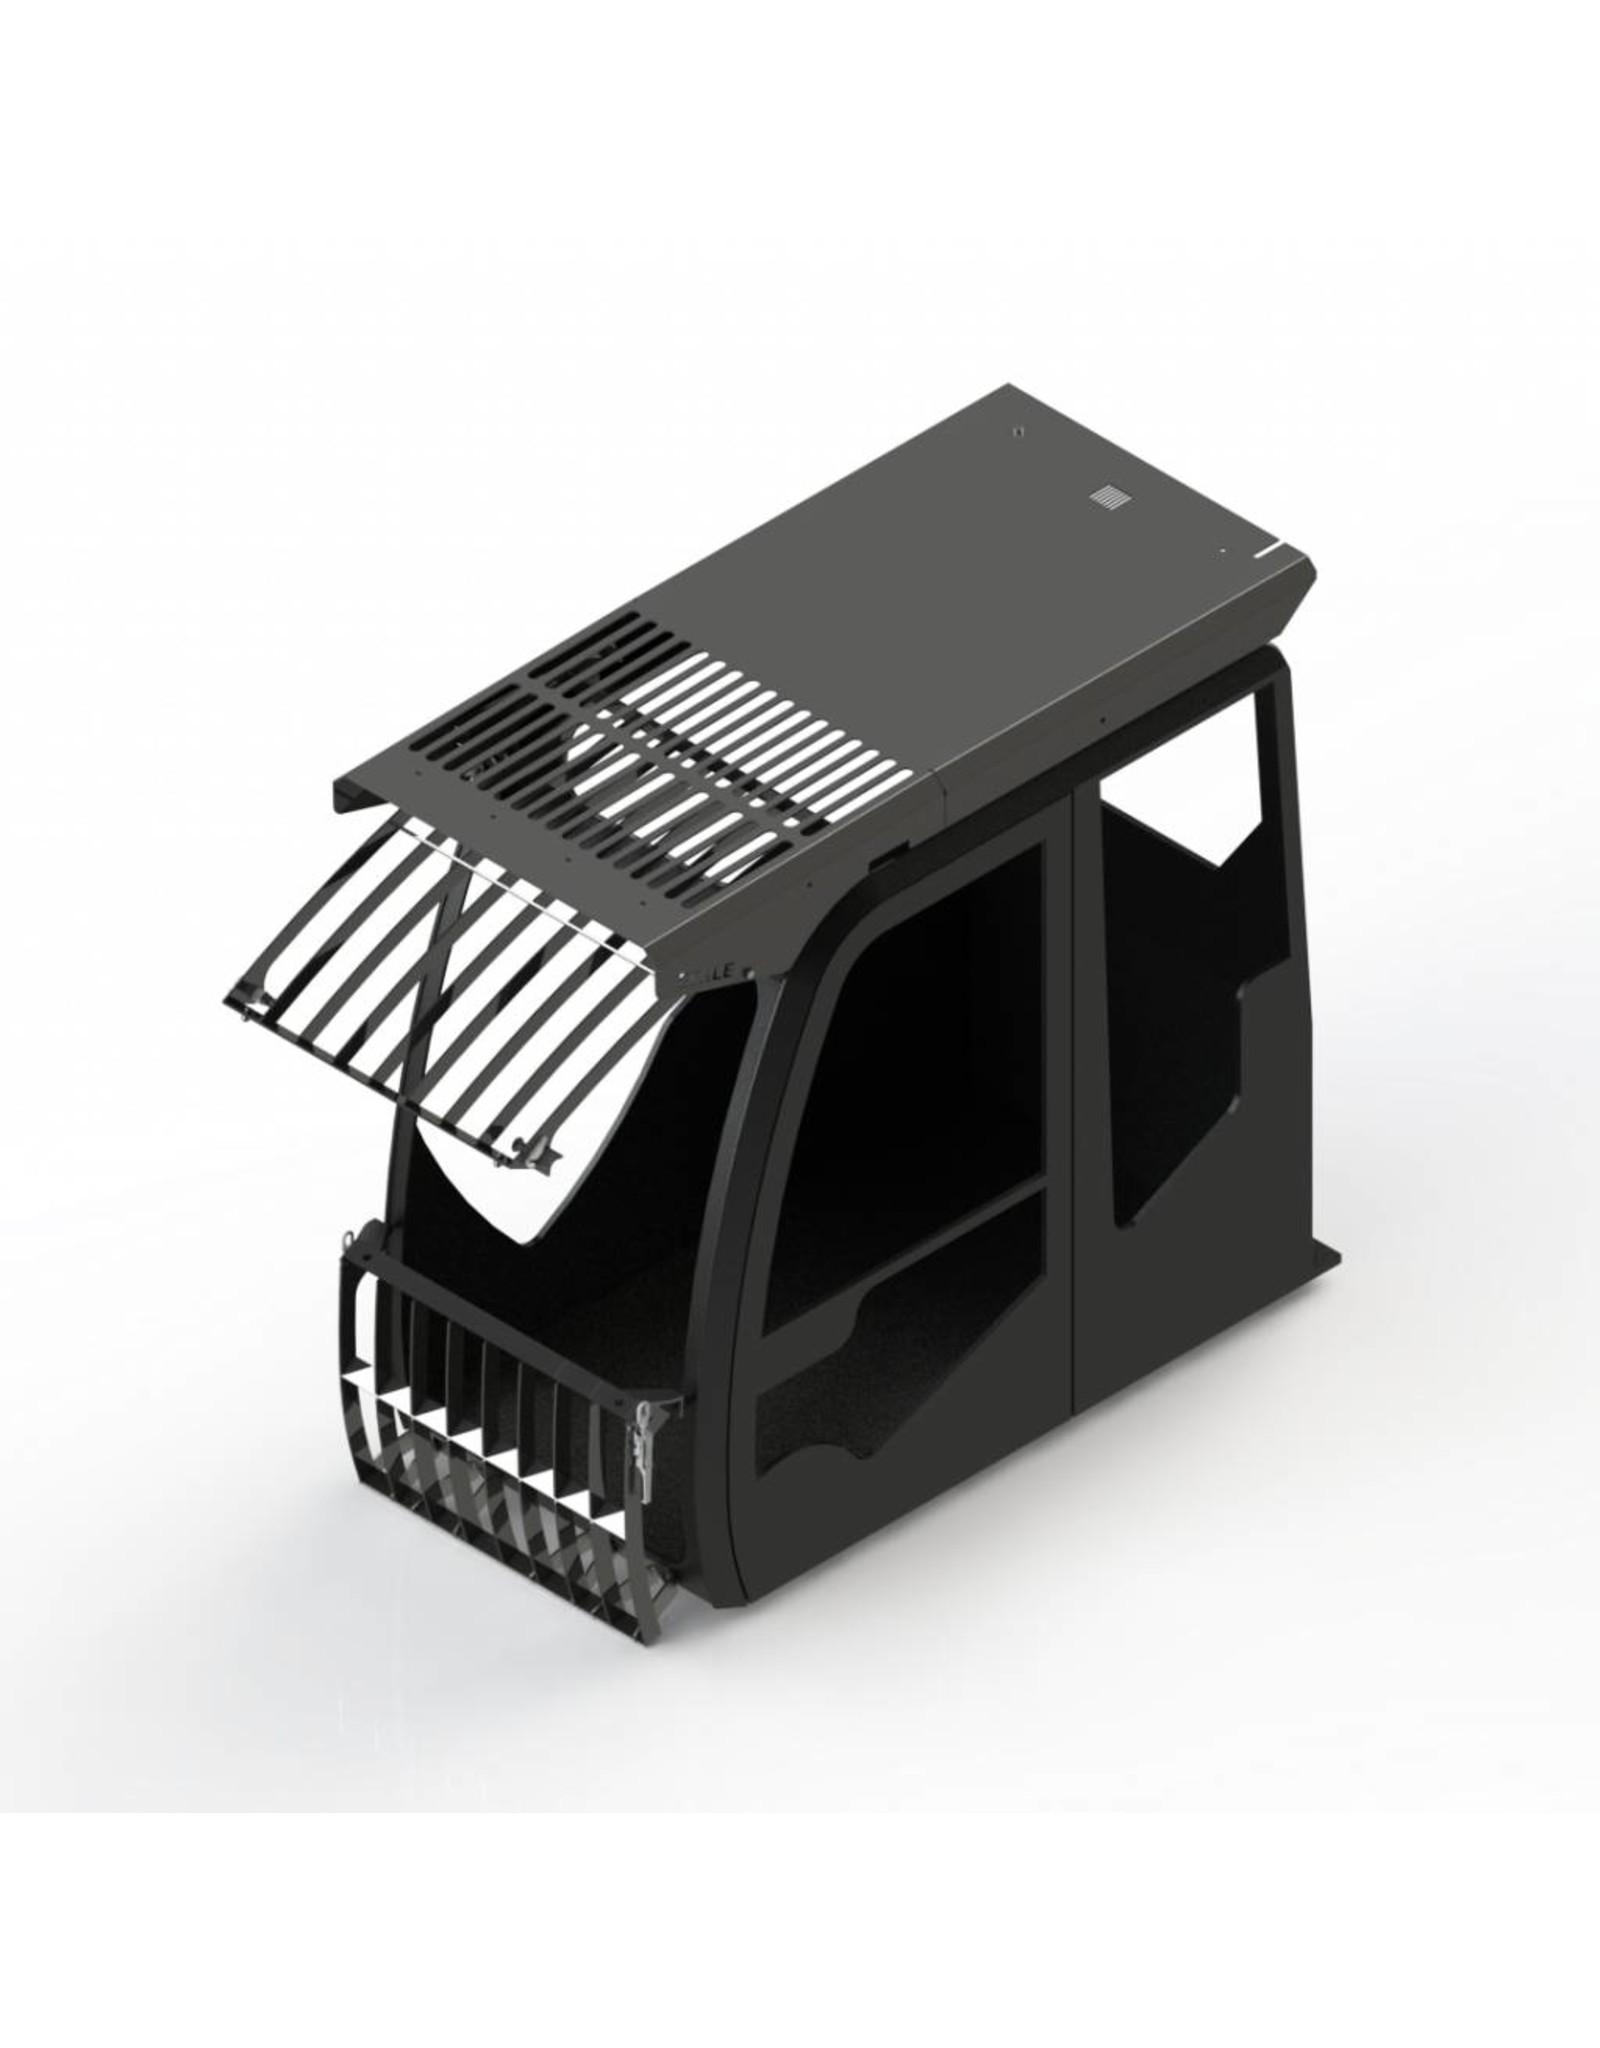 Echle Hartstahl GmbH FOPS for Liebherr R 926